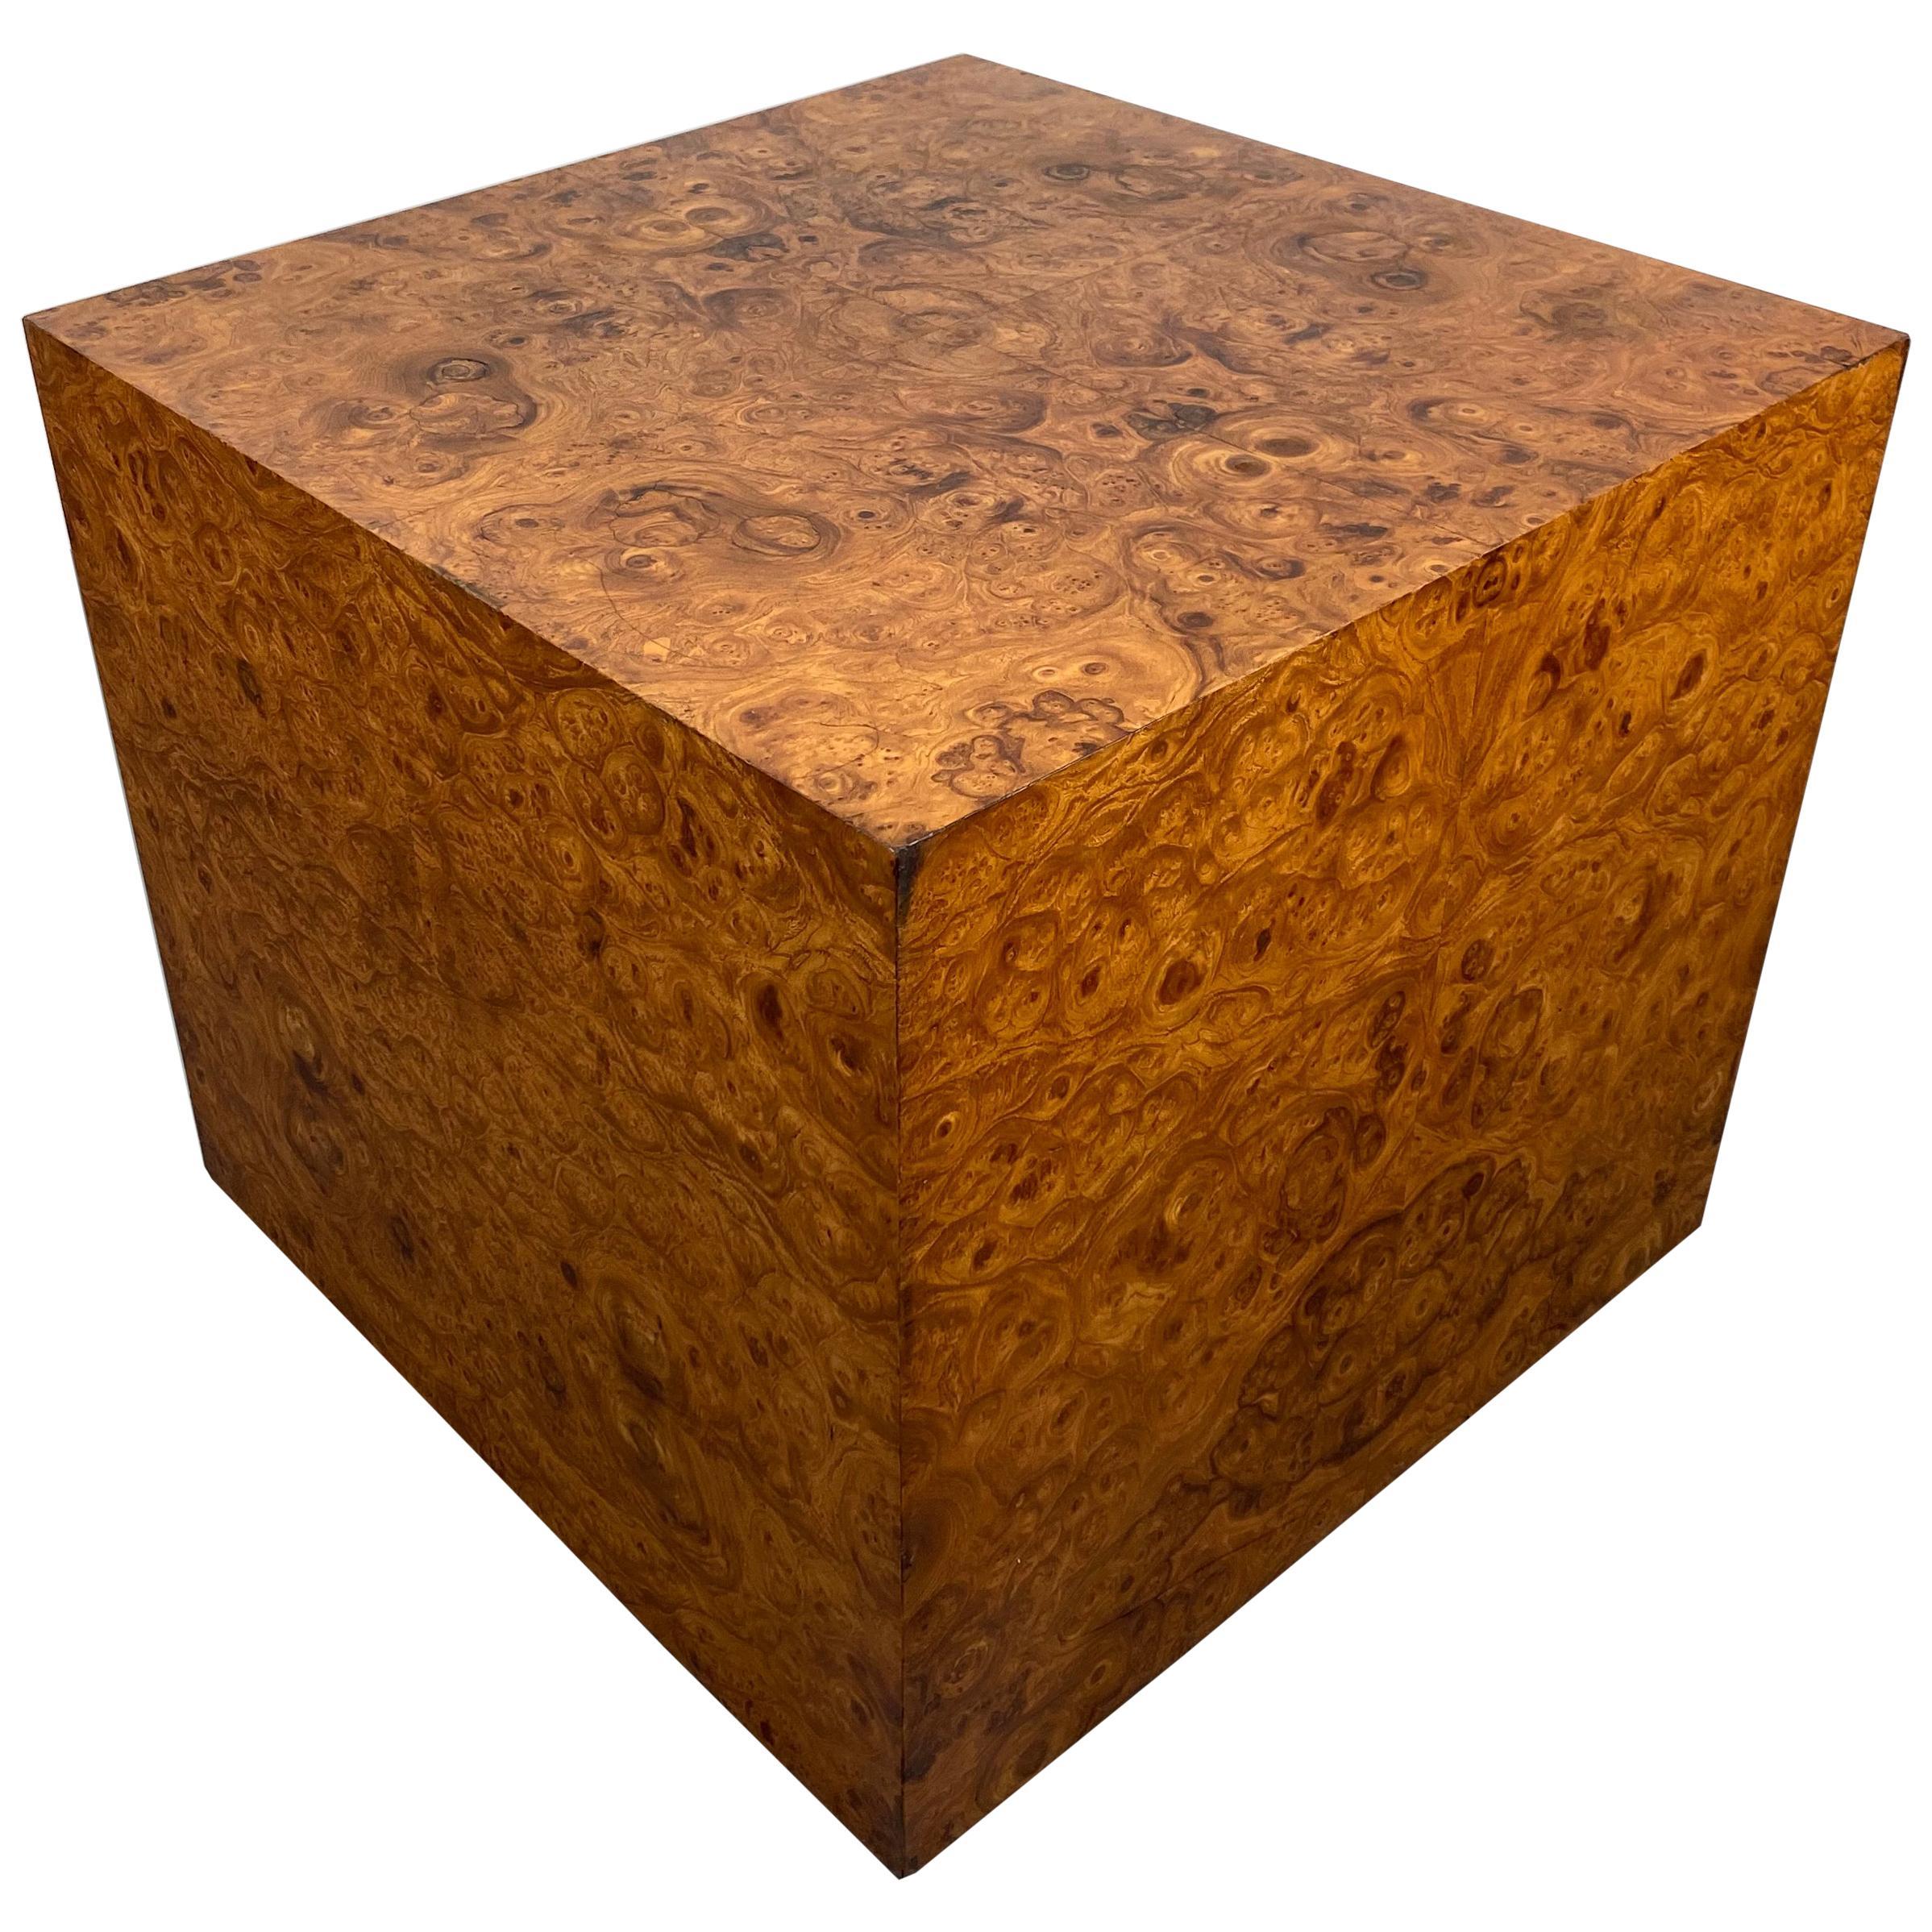 Stunning Burl Wood Cube Table / Pedestal by Milo Baughman